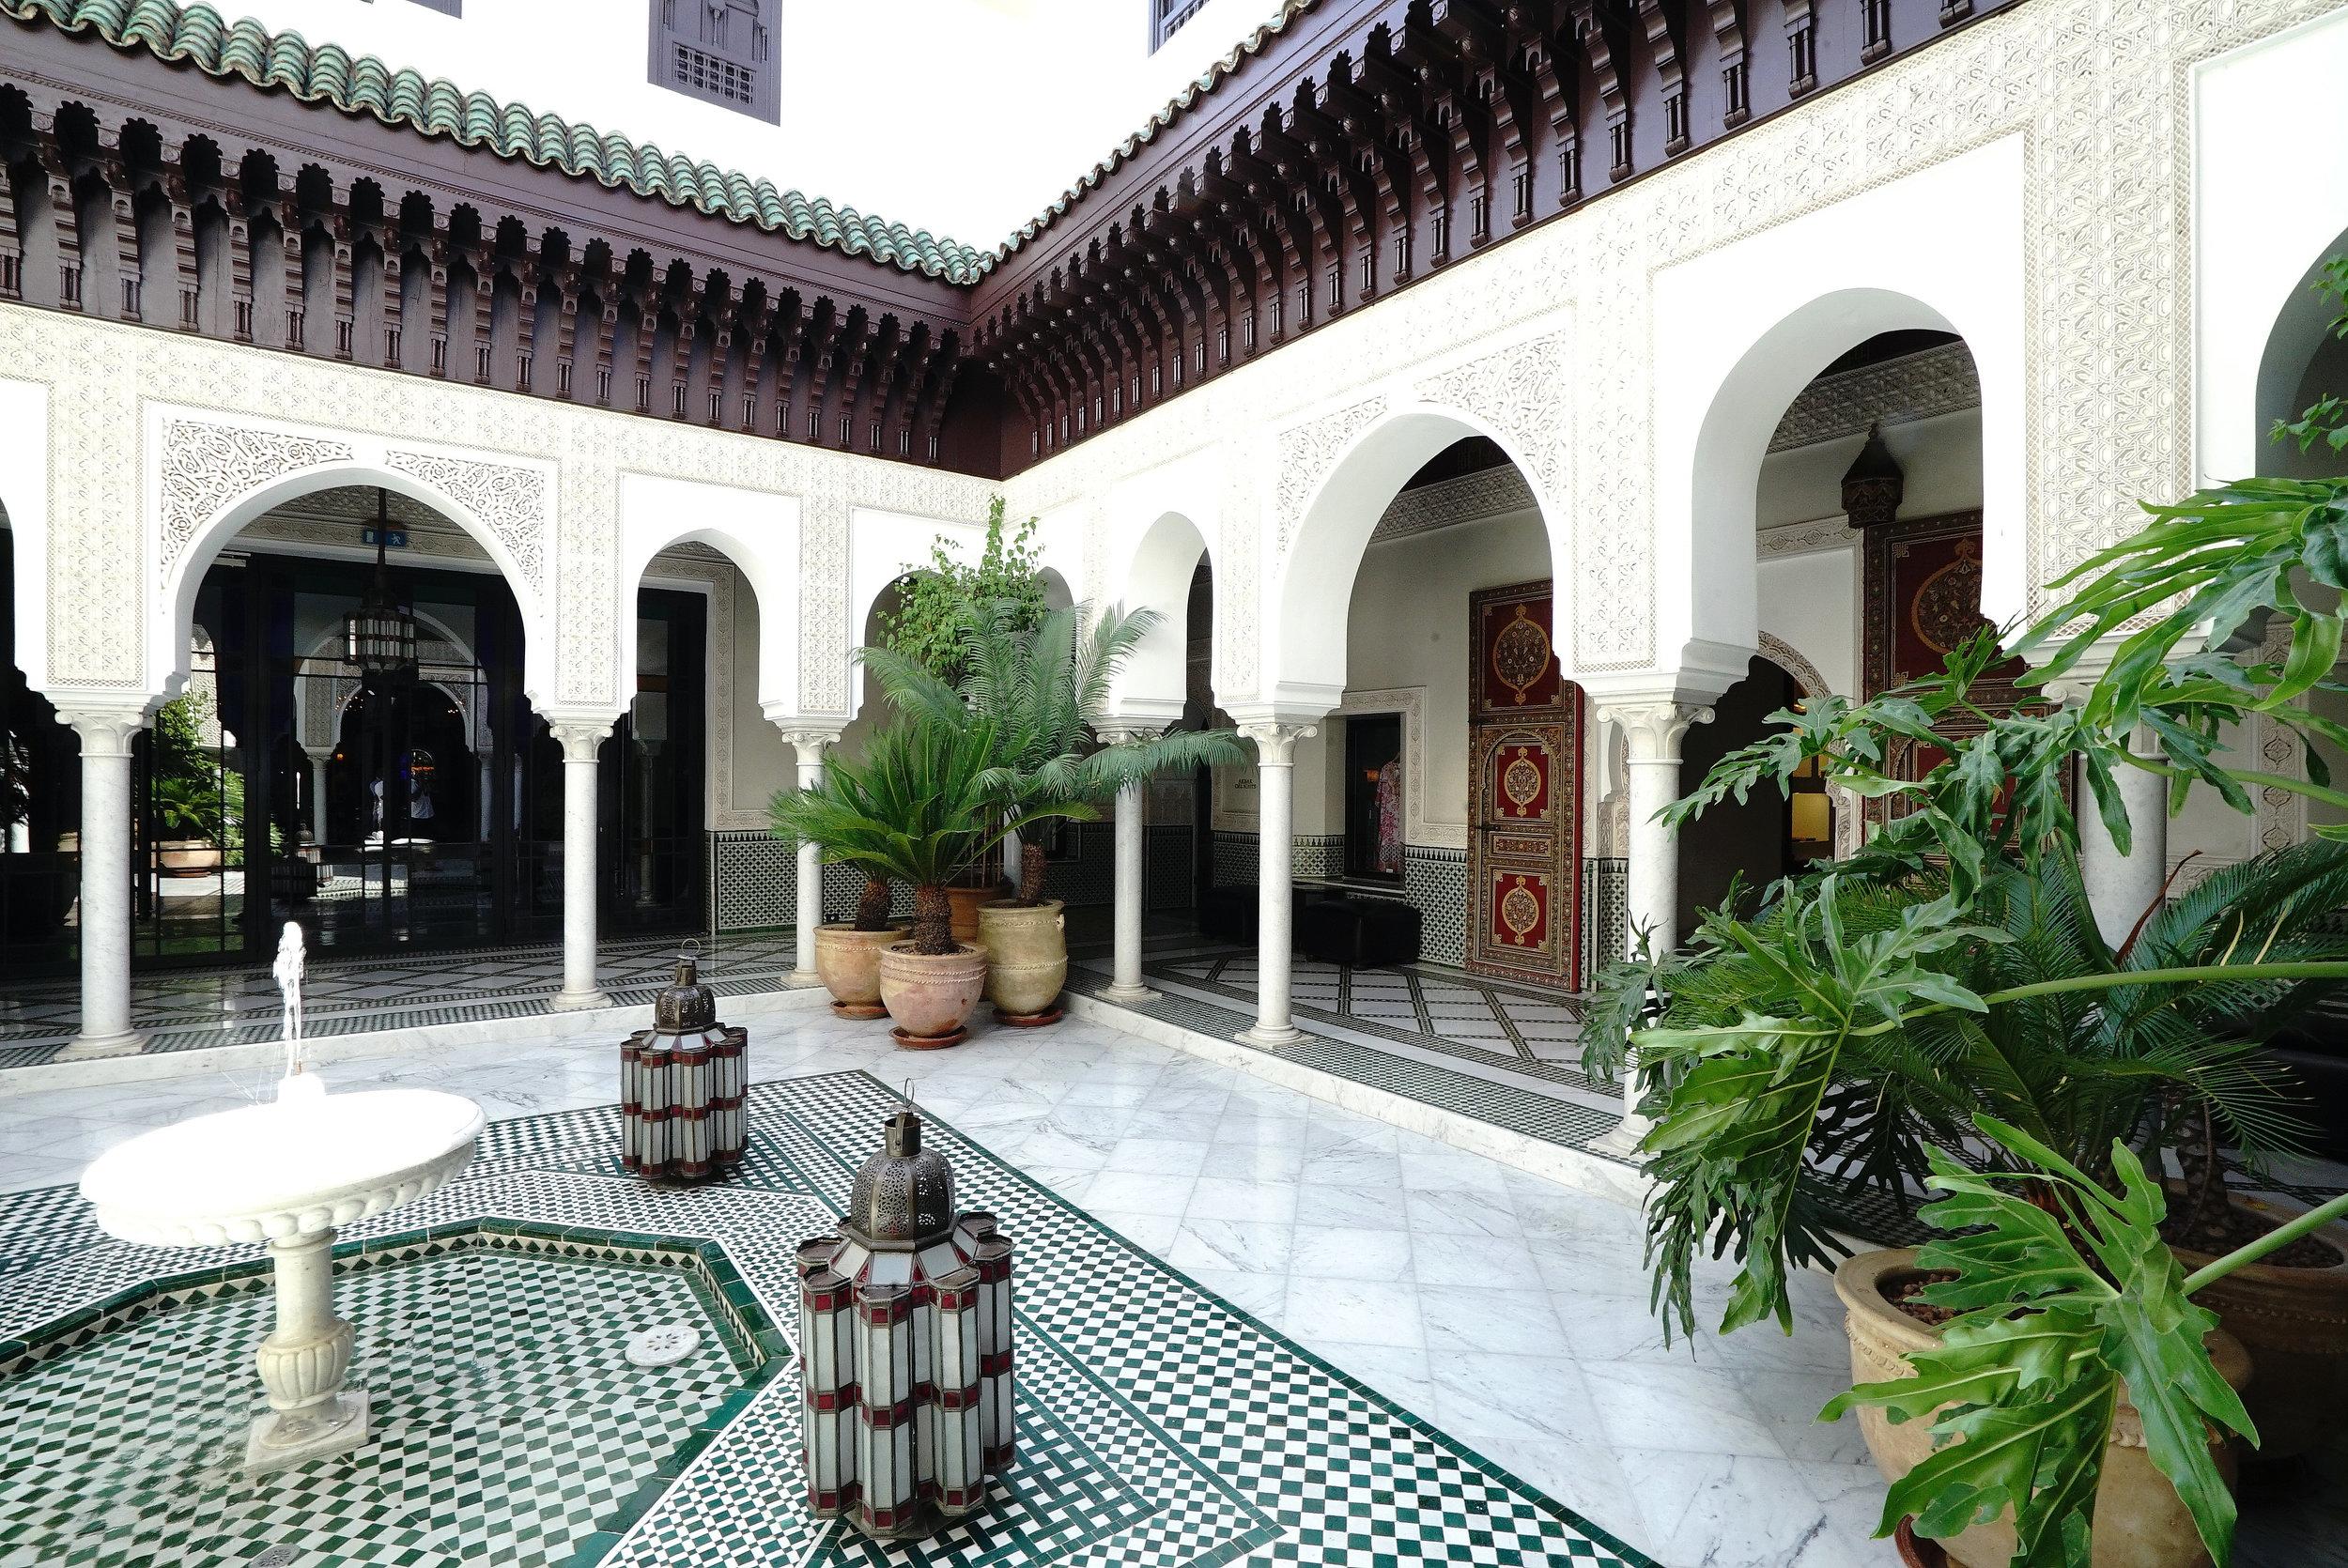 La Mamounia Morocco Courtyard.jpg